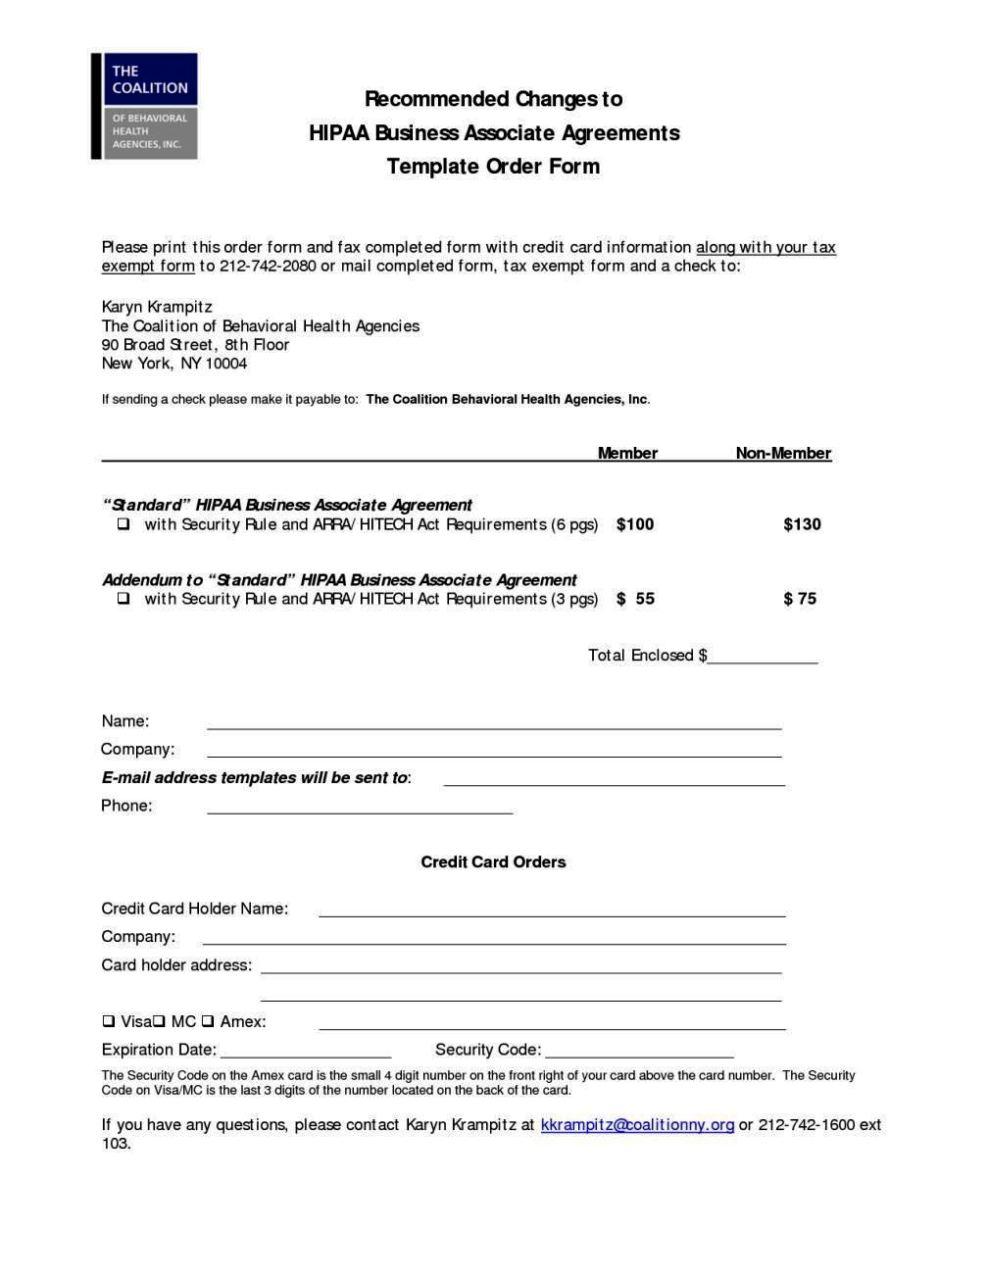 hipaa business associate agreement template. Black Bedroom Furniture Sets. Home Design Ideas